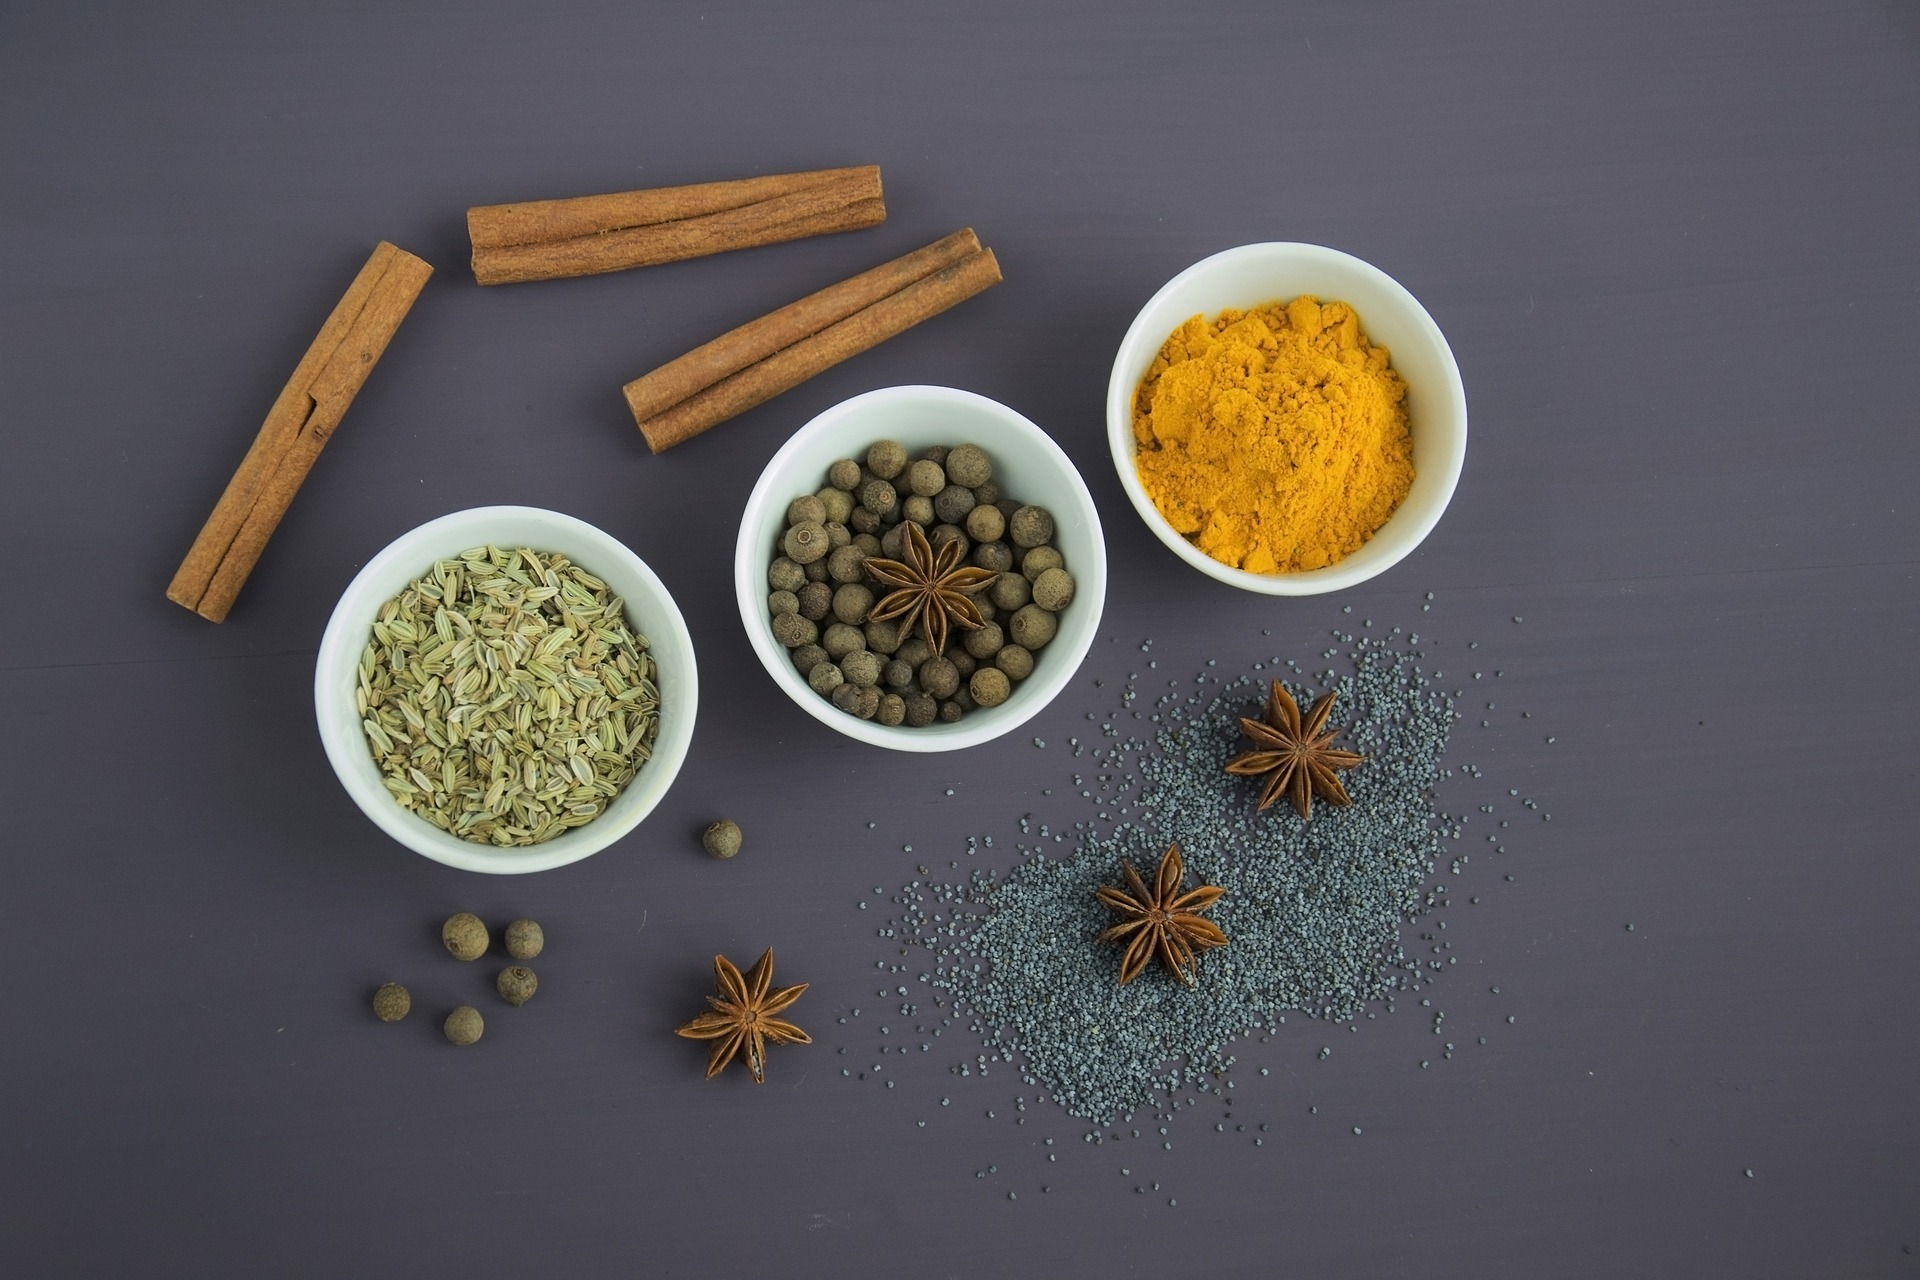 turmeric si piper negru - sfatulparintilor.ro - pixabay_com - spices-2105541_1920